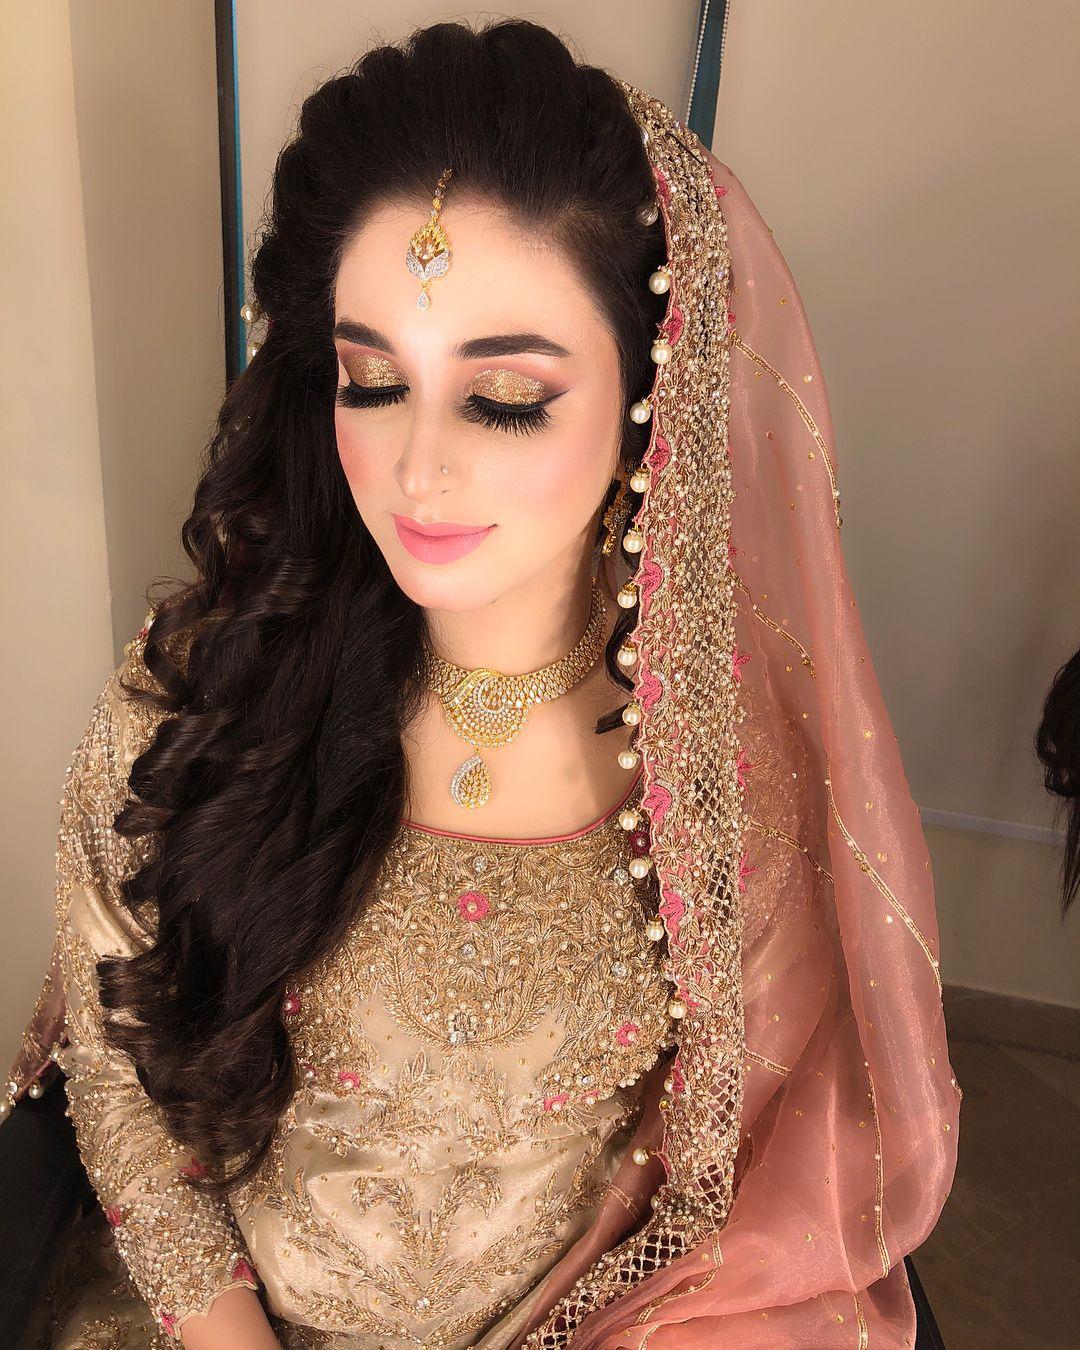 Pakistani Hairstyles Buns: Pakistani Brides Giving Major Bridal Hairstyle Goals